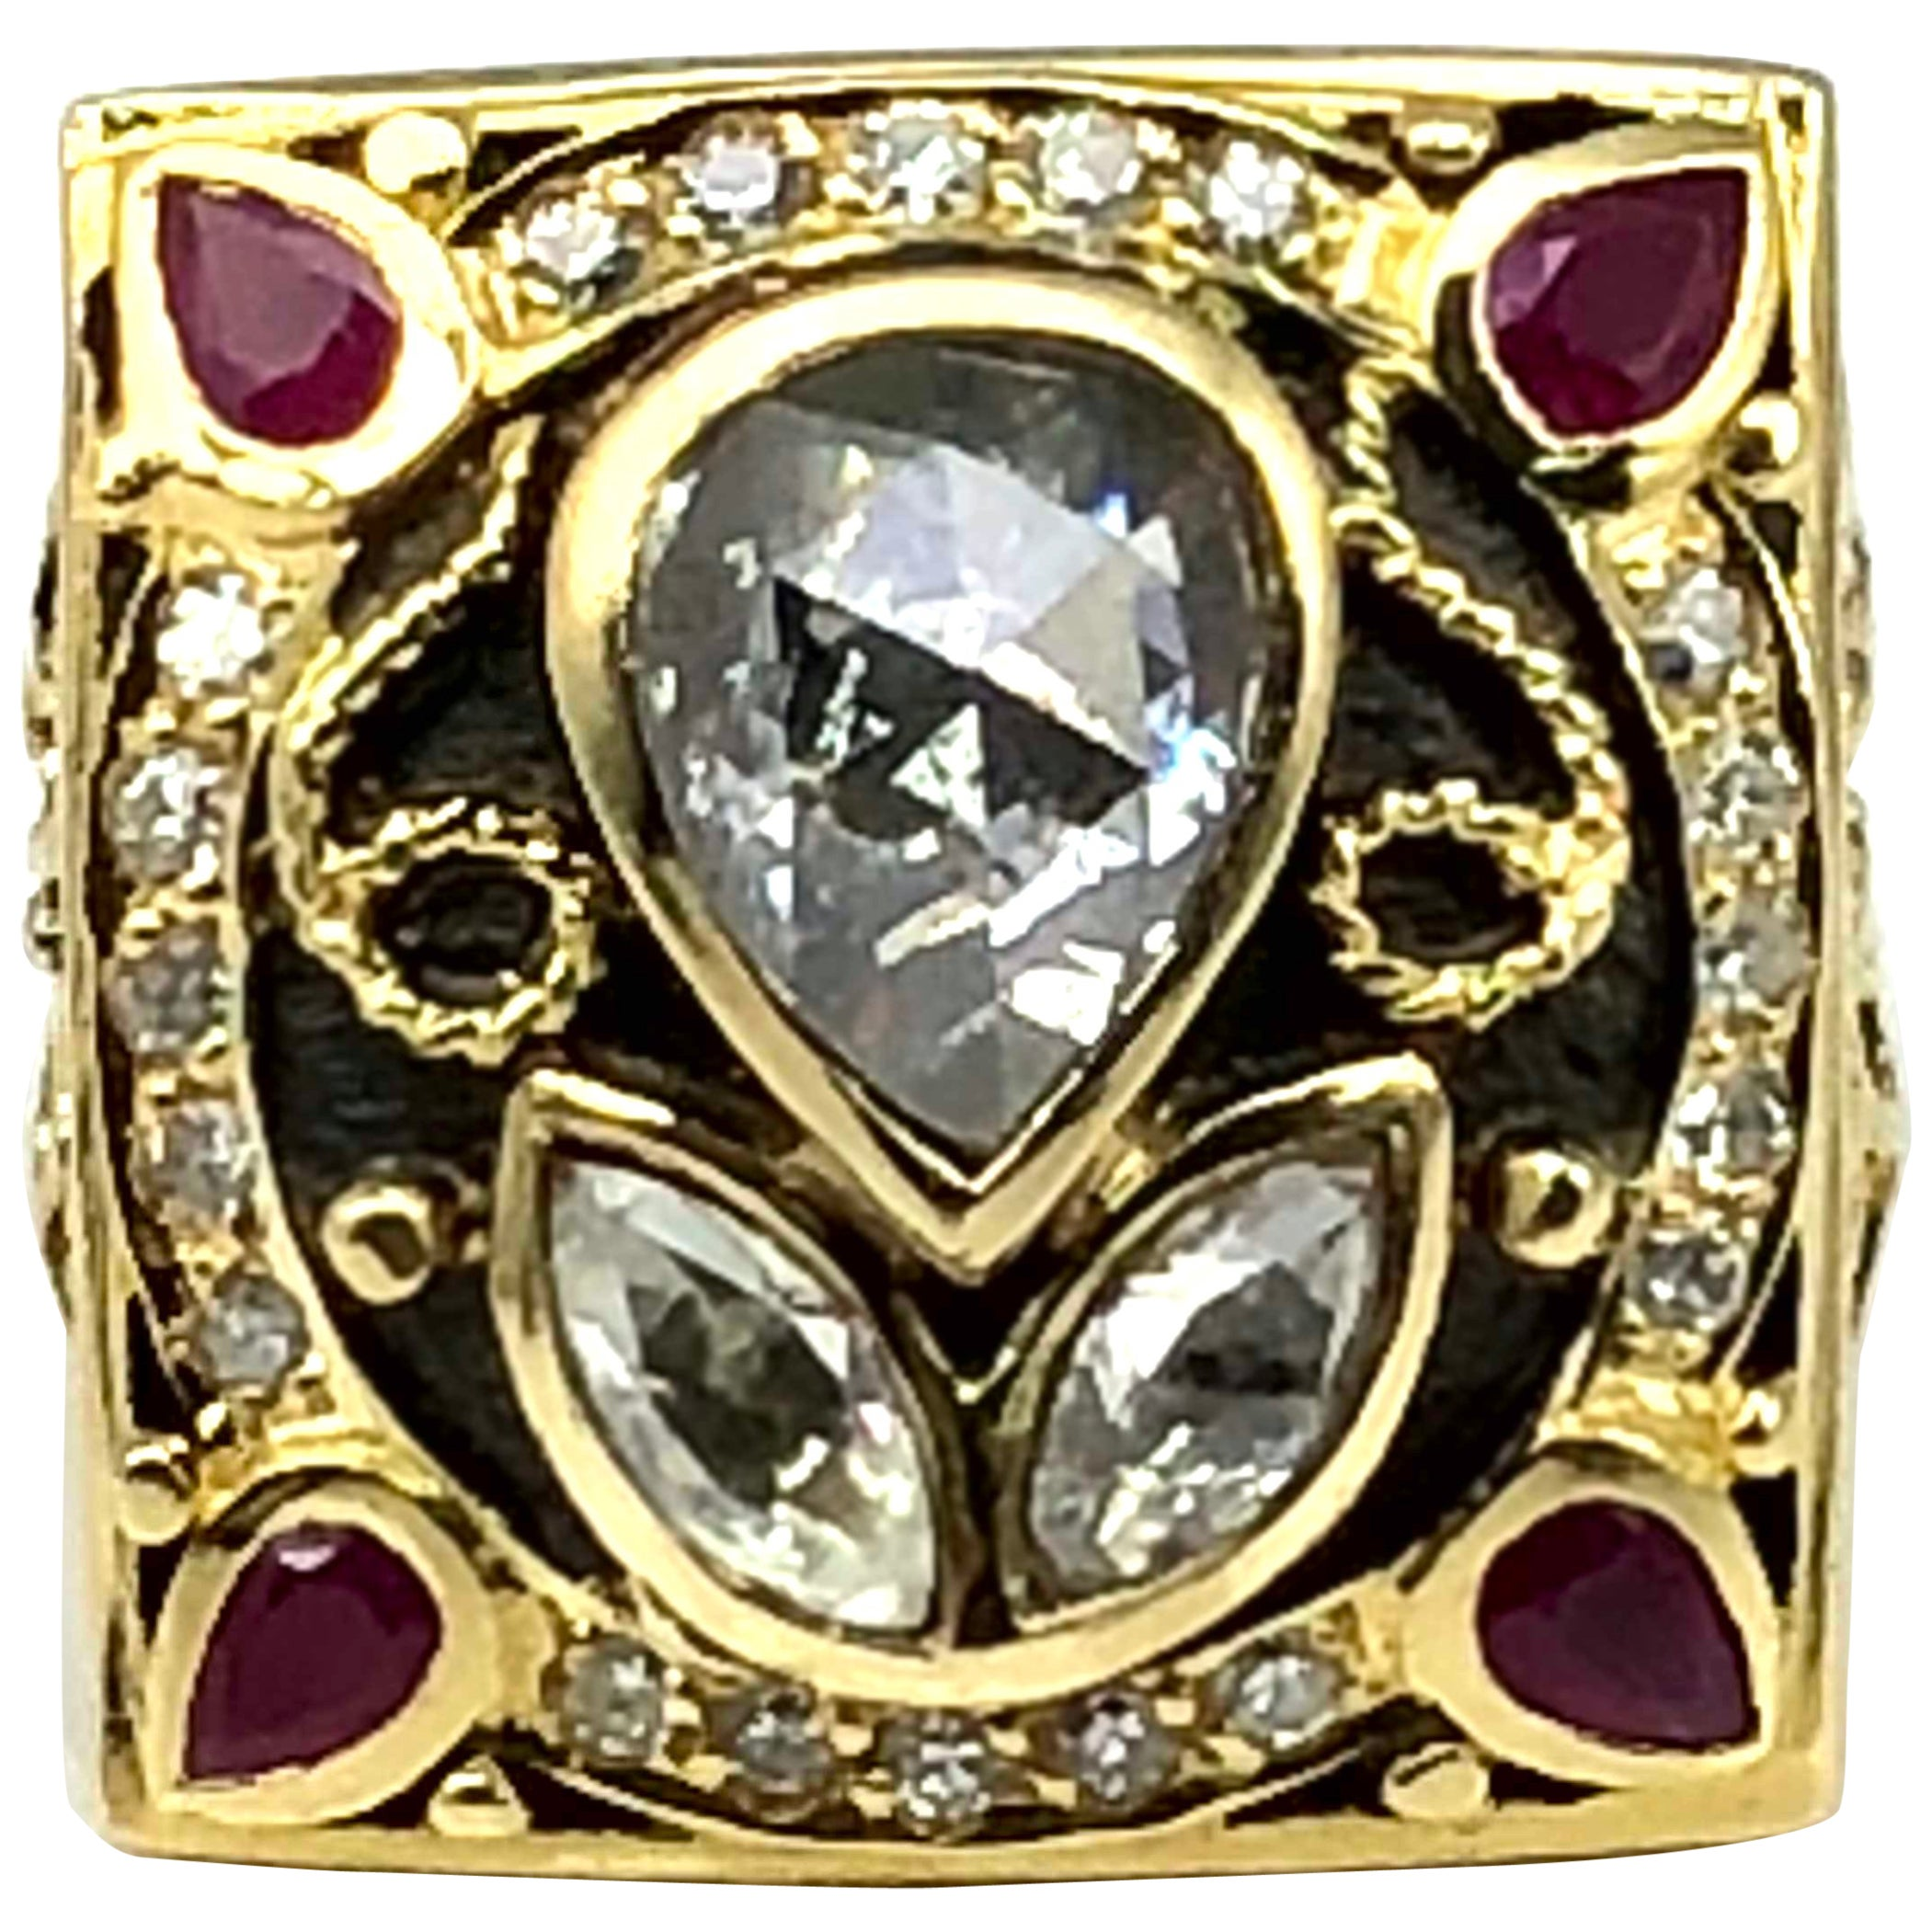 Georgios Collections 18 Karat Yellow Gold 2.36 Carat Old Cut Diamond Ring